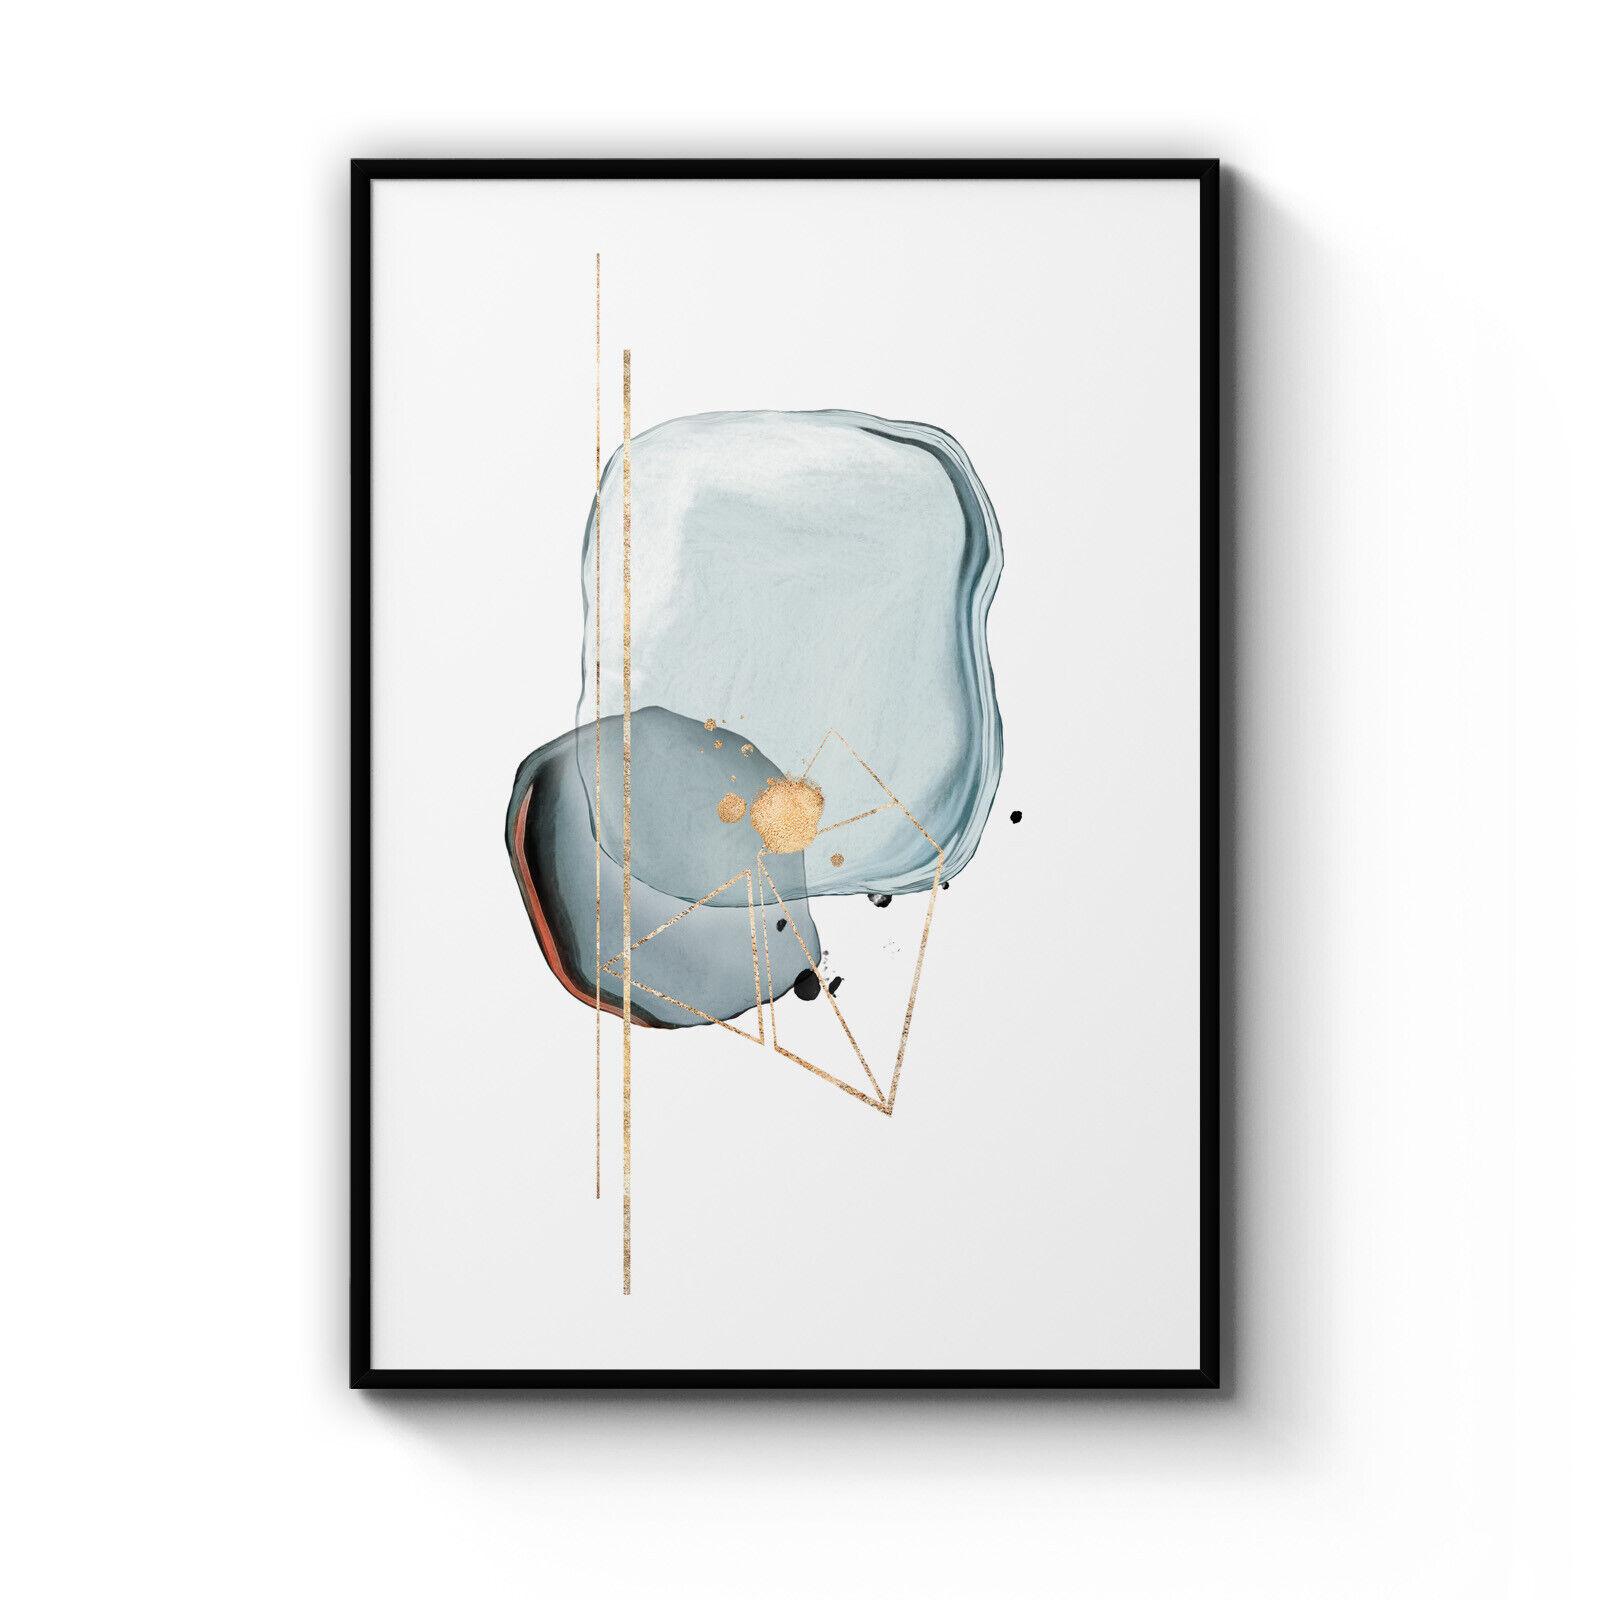 Abstract Art Blau Teal Minimal Shape Home Decor Poster Print  A4 - B1 Framed